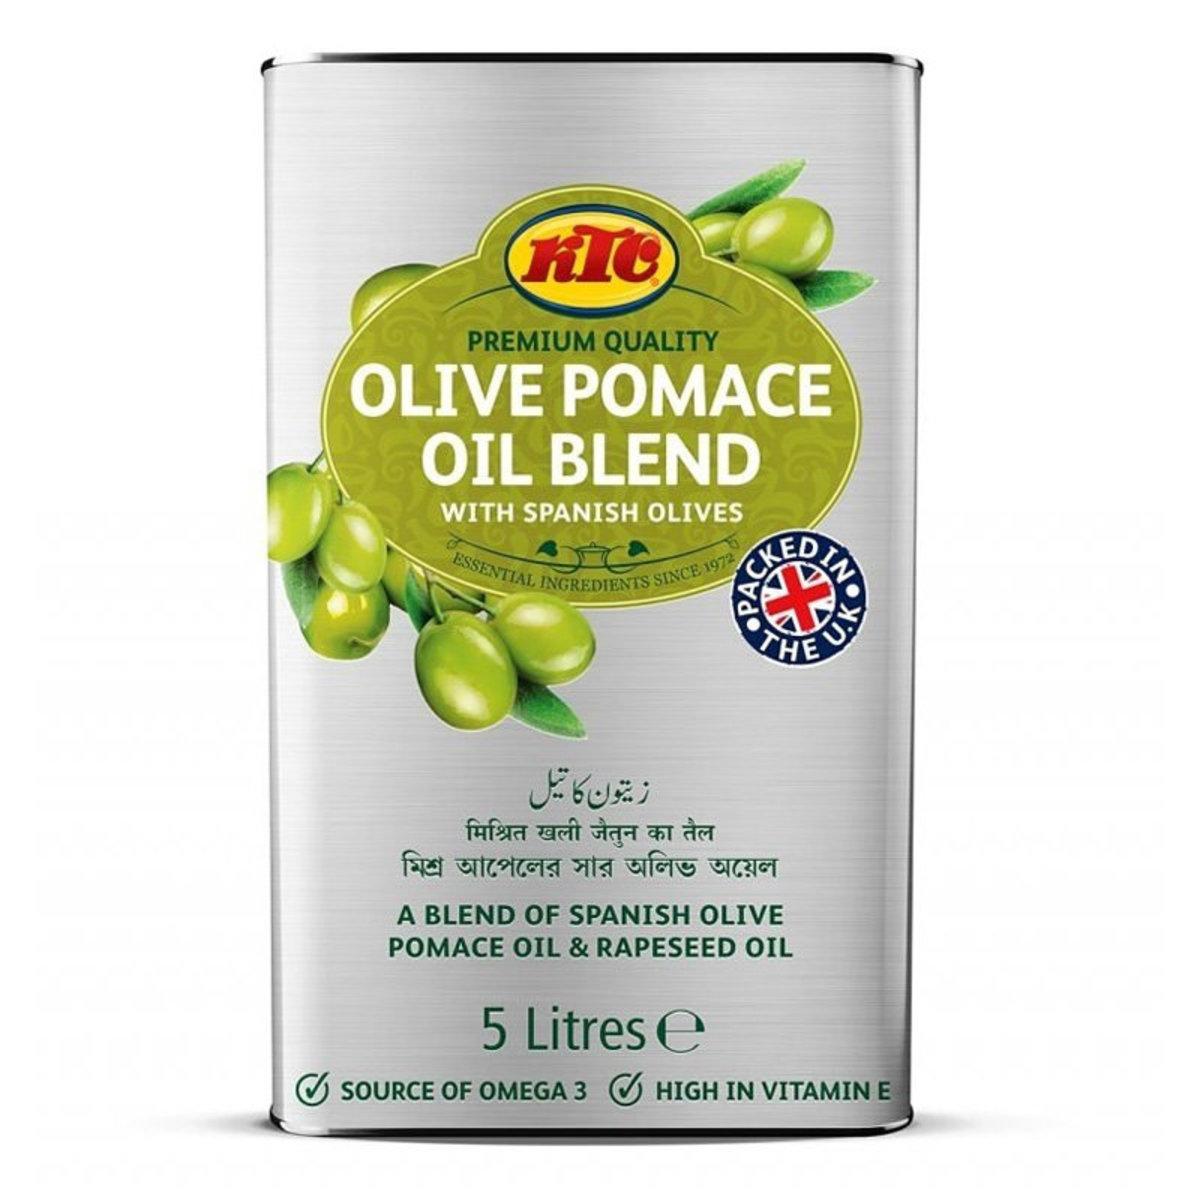 Pomace olive oil 5 ltr